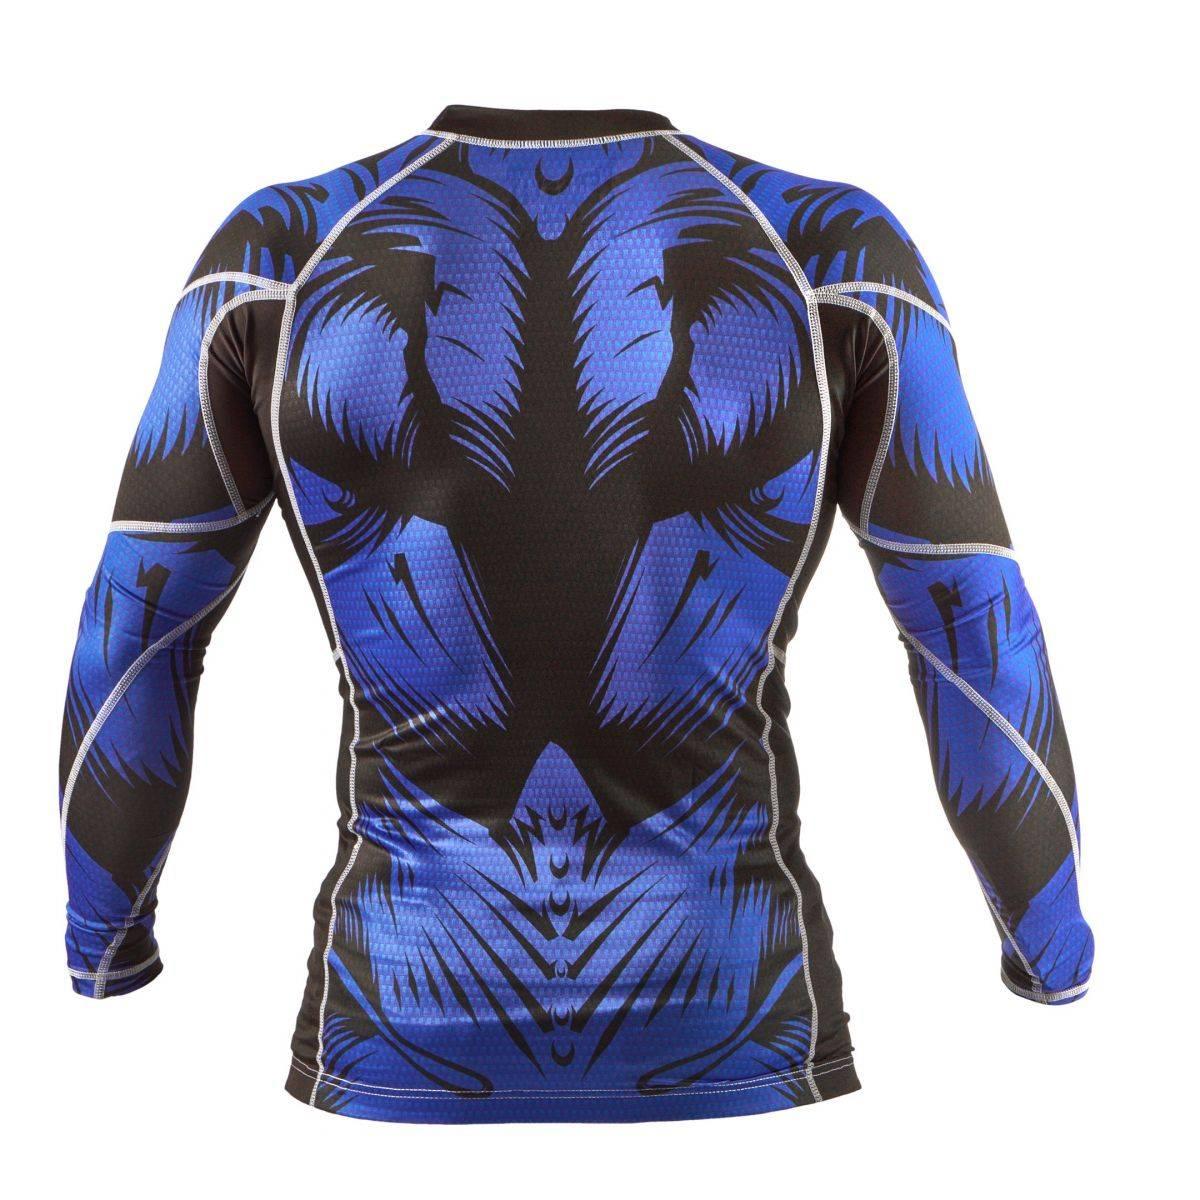 Компрессионная кофта Peresvit Immortal Silver Force Blue-S